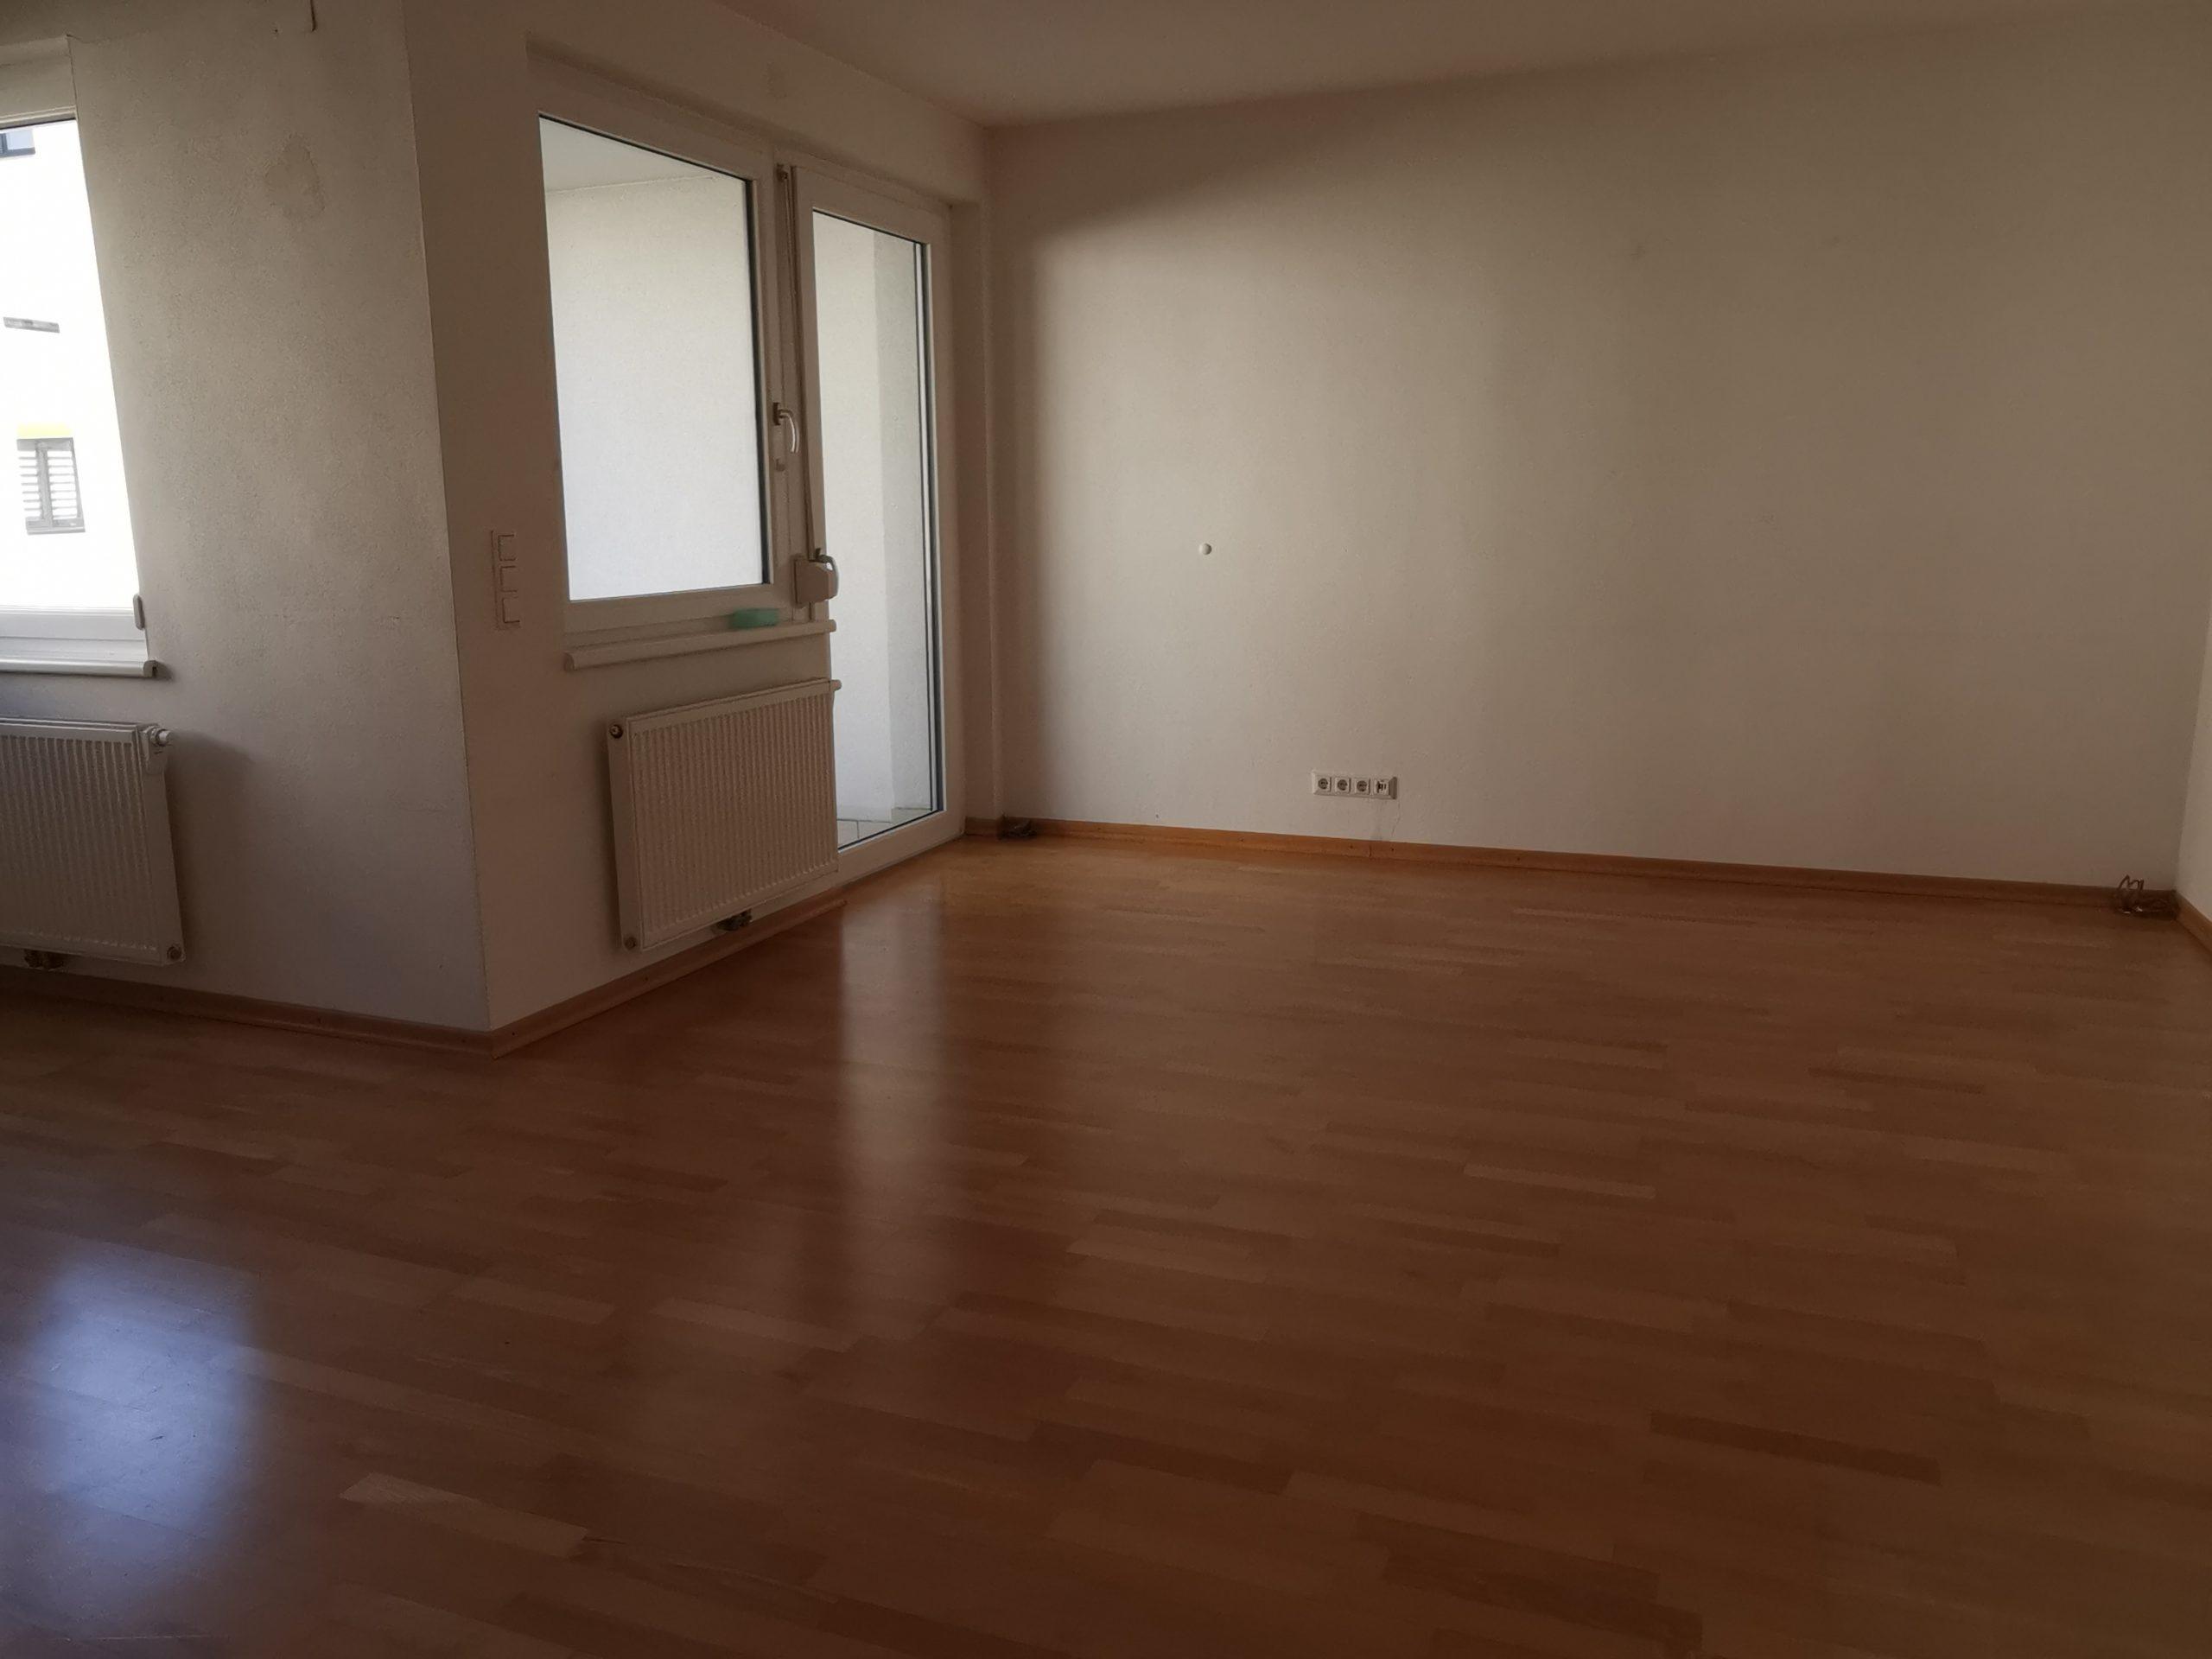 Immobilie von Kamptal in 3580 Horn, Horn, Horn VI/2 - Top 206 #0